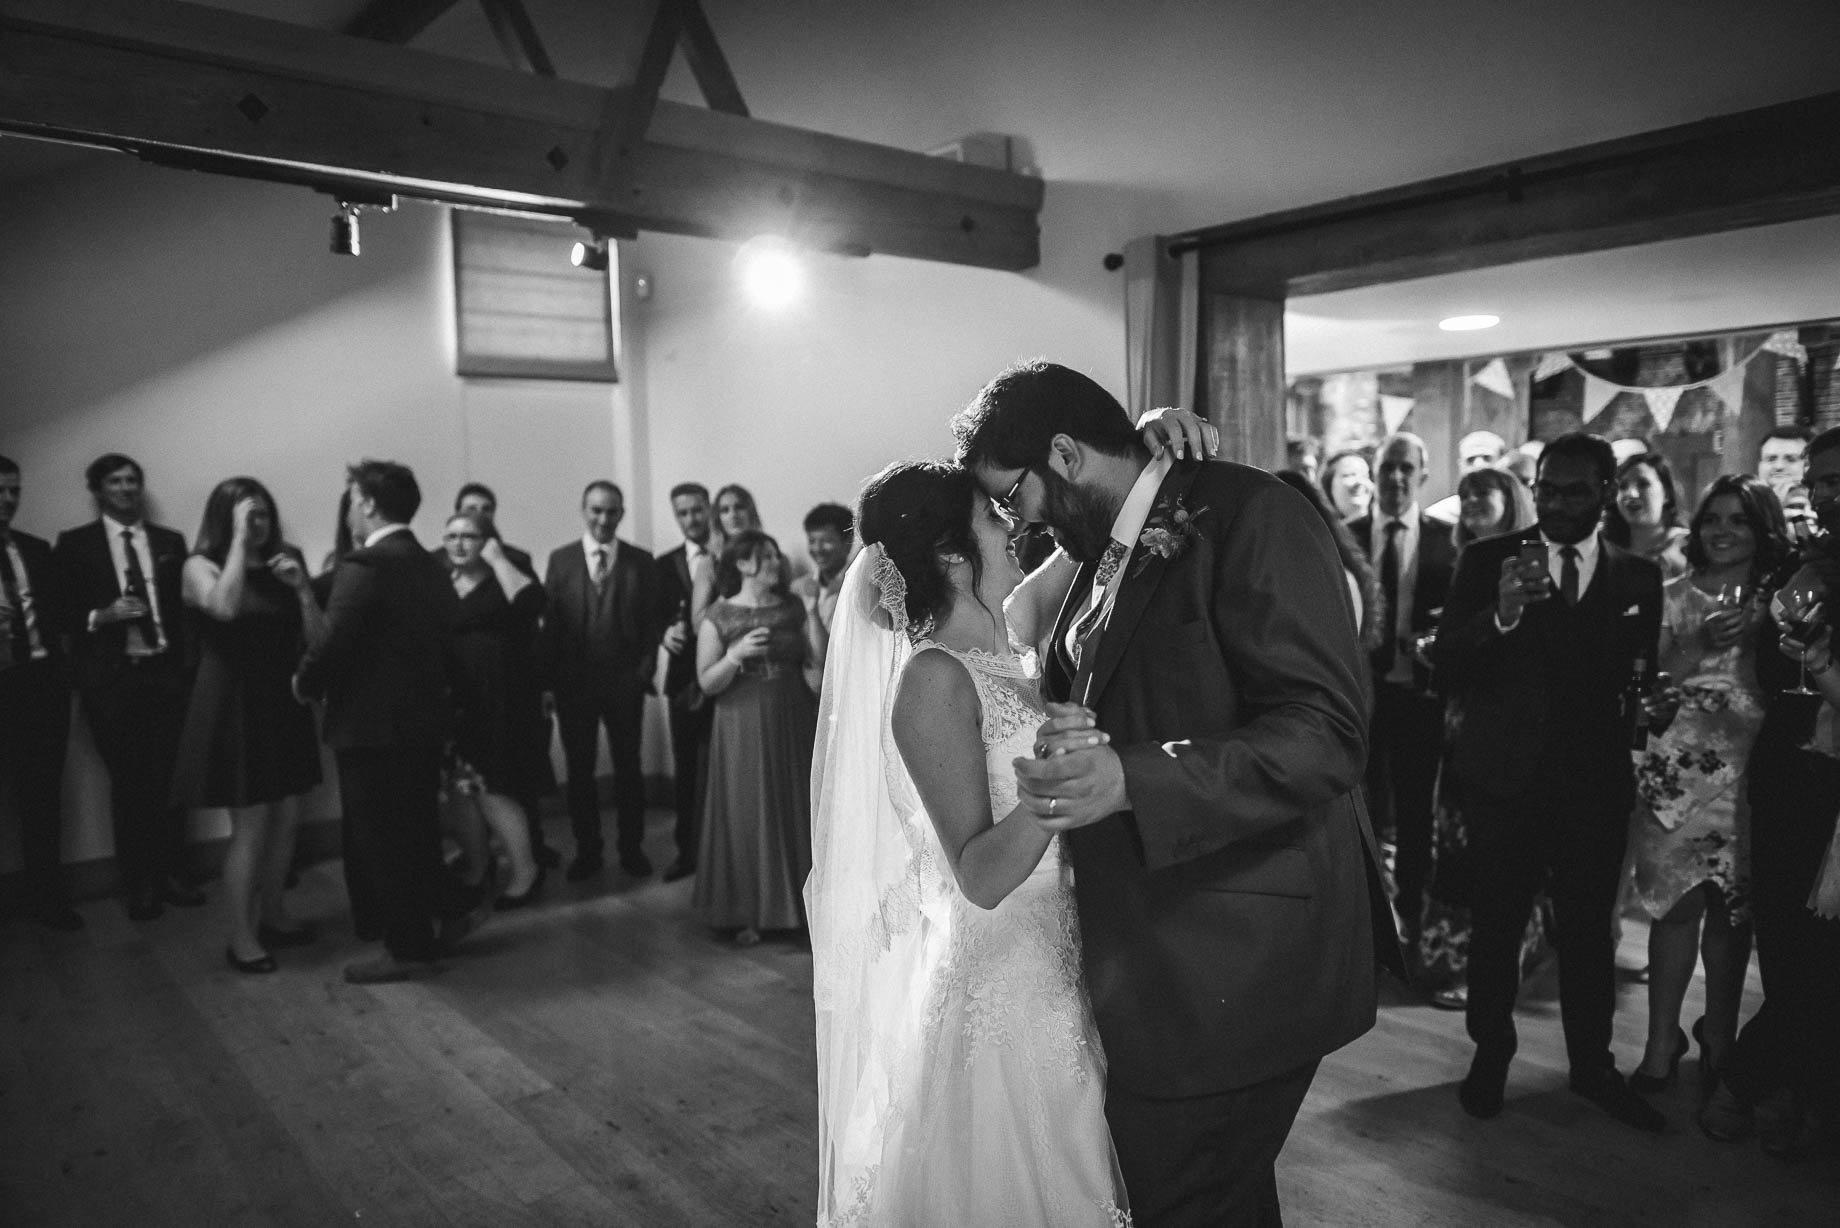 Gaynes Park wedding photography - Guy Collier Photography - Rachel and Jon (160 of 169)